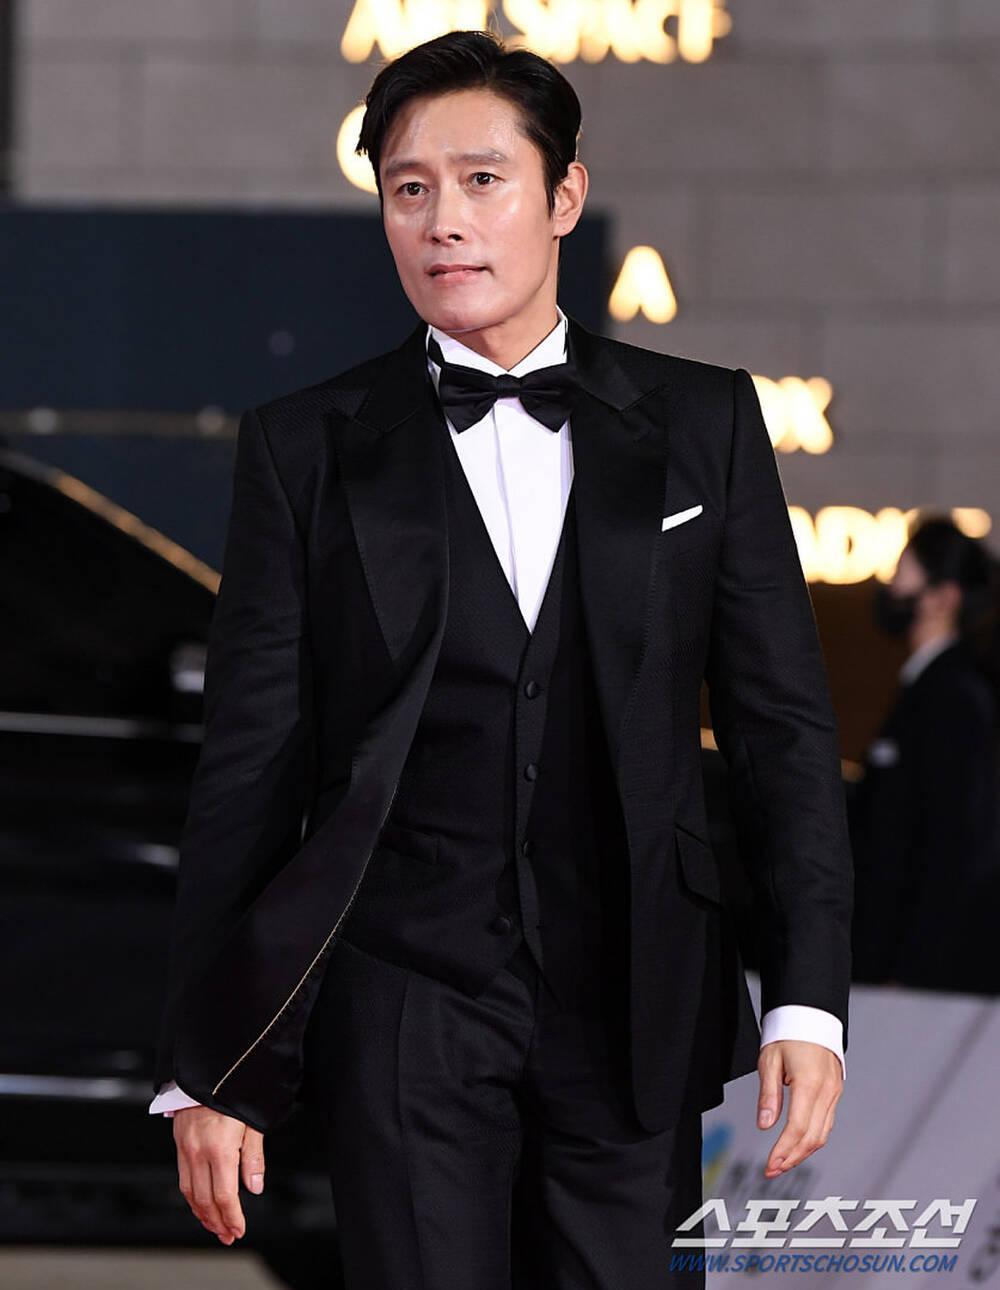 Thảm đỏ 'Rồng xanh 2020': Shin Hye Sun 'cân sắc' Shin Min Ah, Jung Woo Sung - Lee Byung Hun điển trai! Ảnh 26